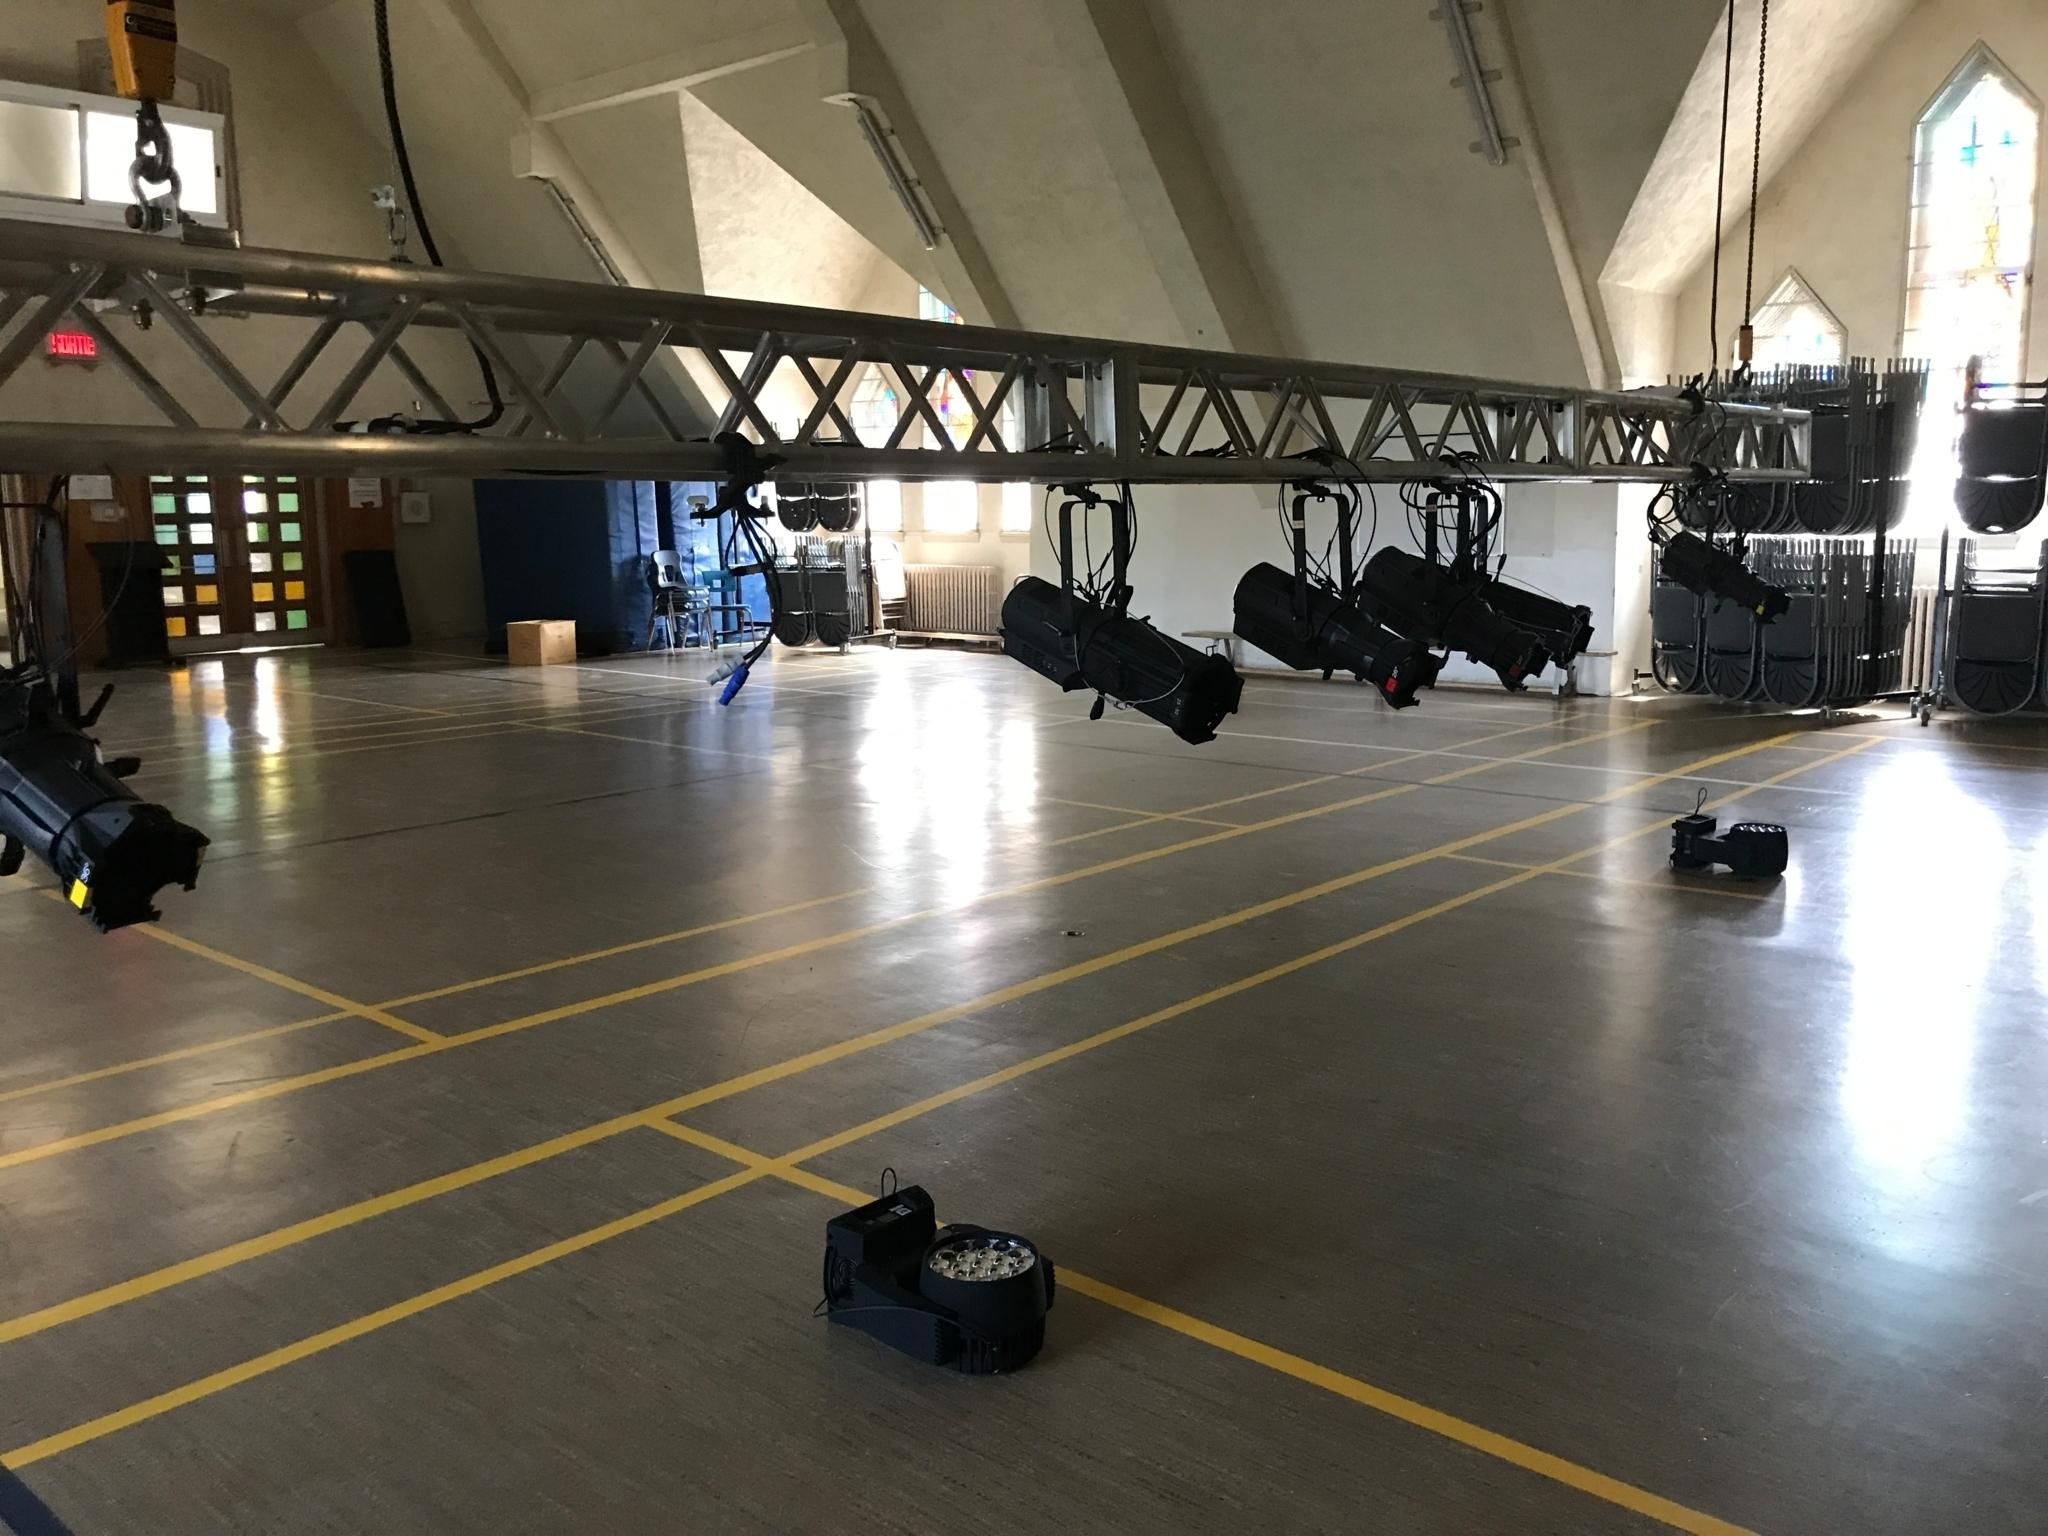 E-lite inc à Montréal: Professional DMX lighting installation for an auditorium in a college in Montreal. Chauvet Pro.